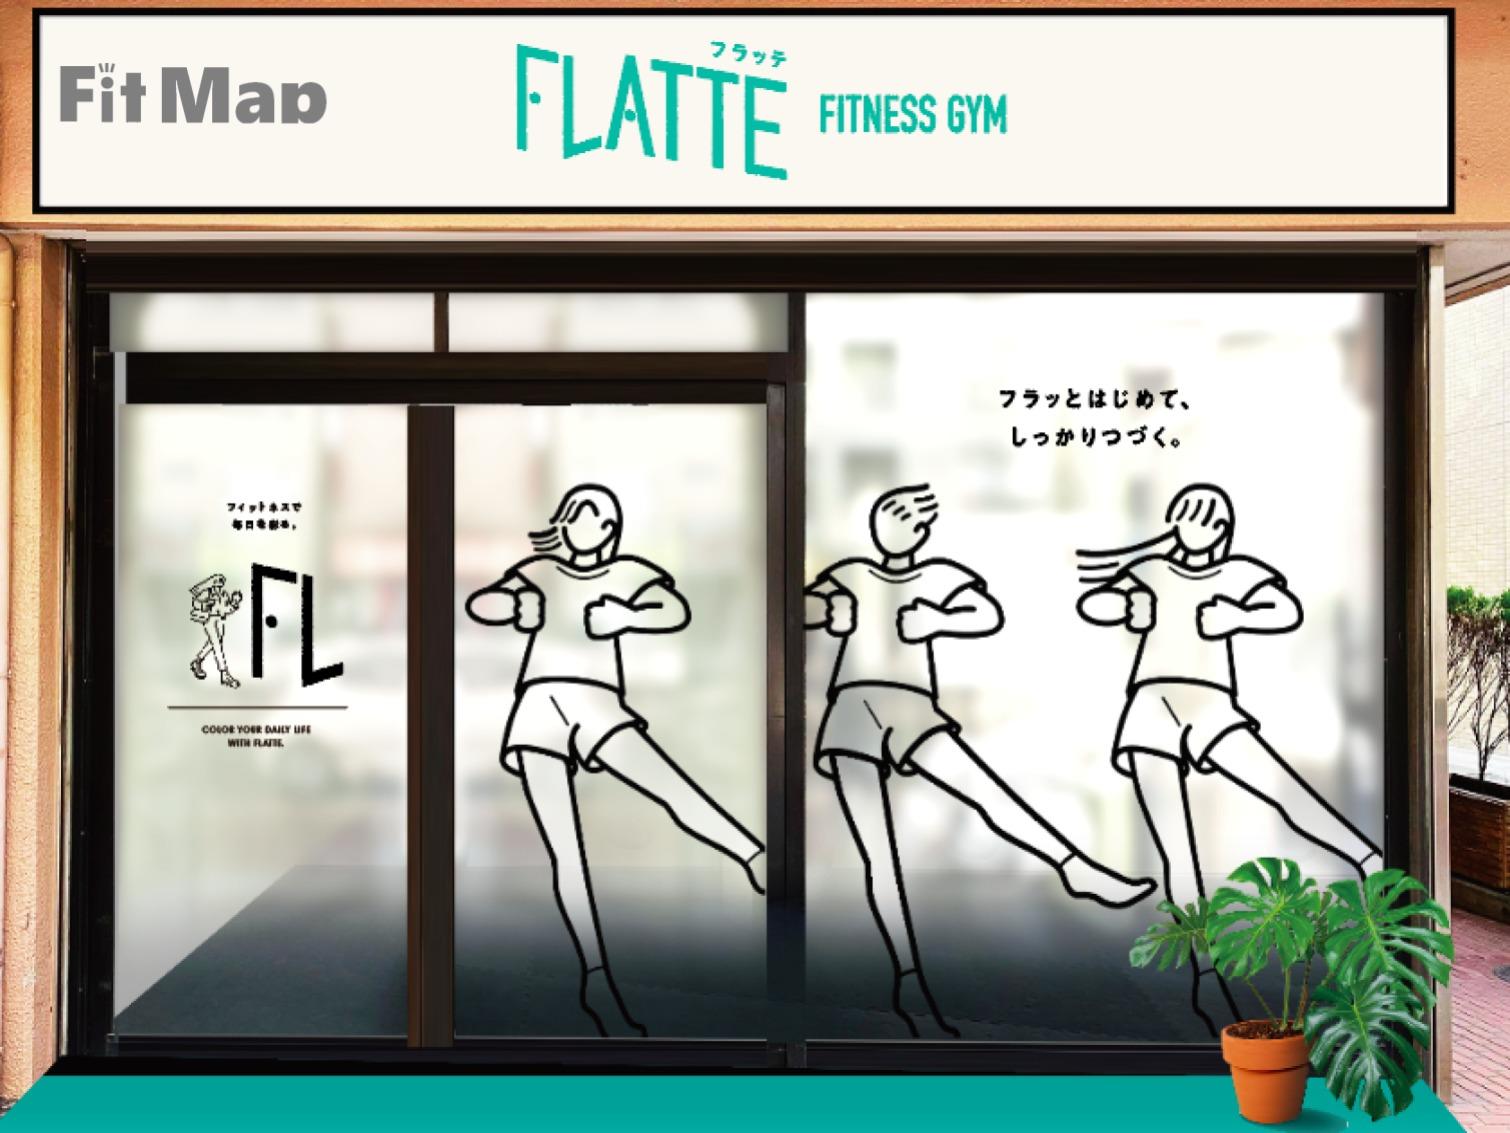 FLATTE FITNESS GYMの施設画像